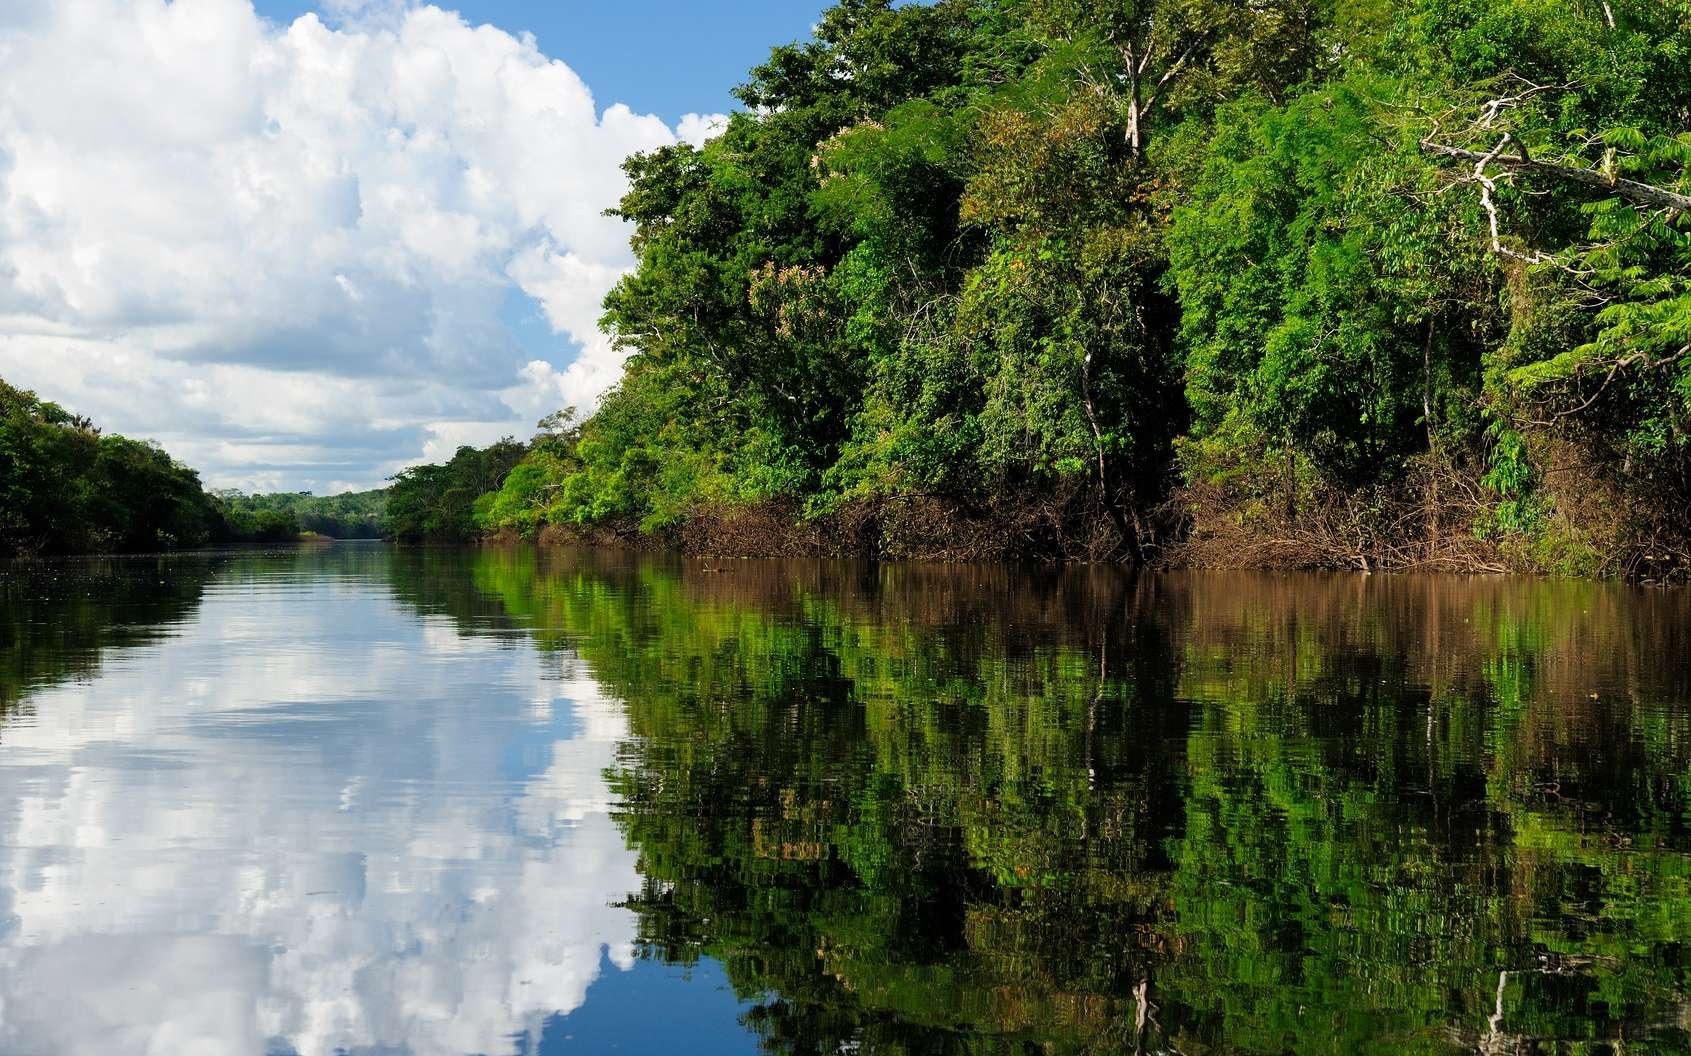 L'Amazone serait le plus long fleuve au monde. © Rafal Cichawa, Fotolia